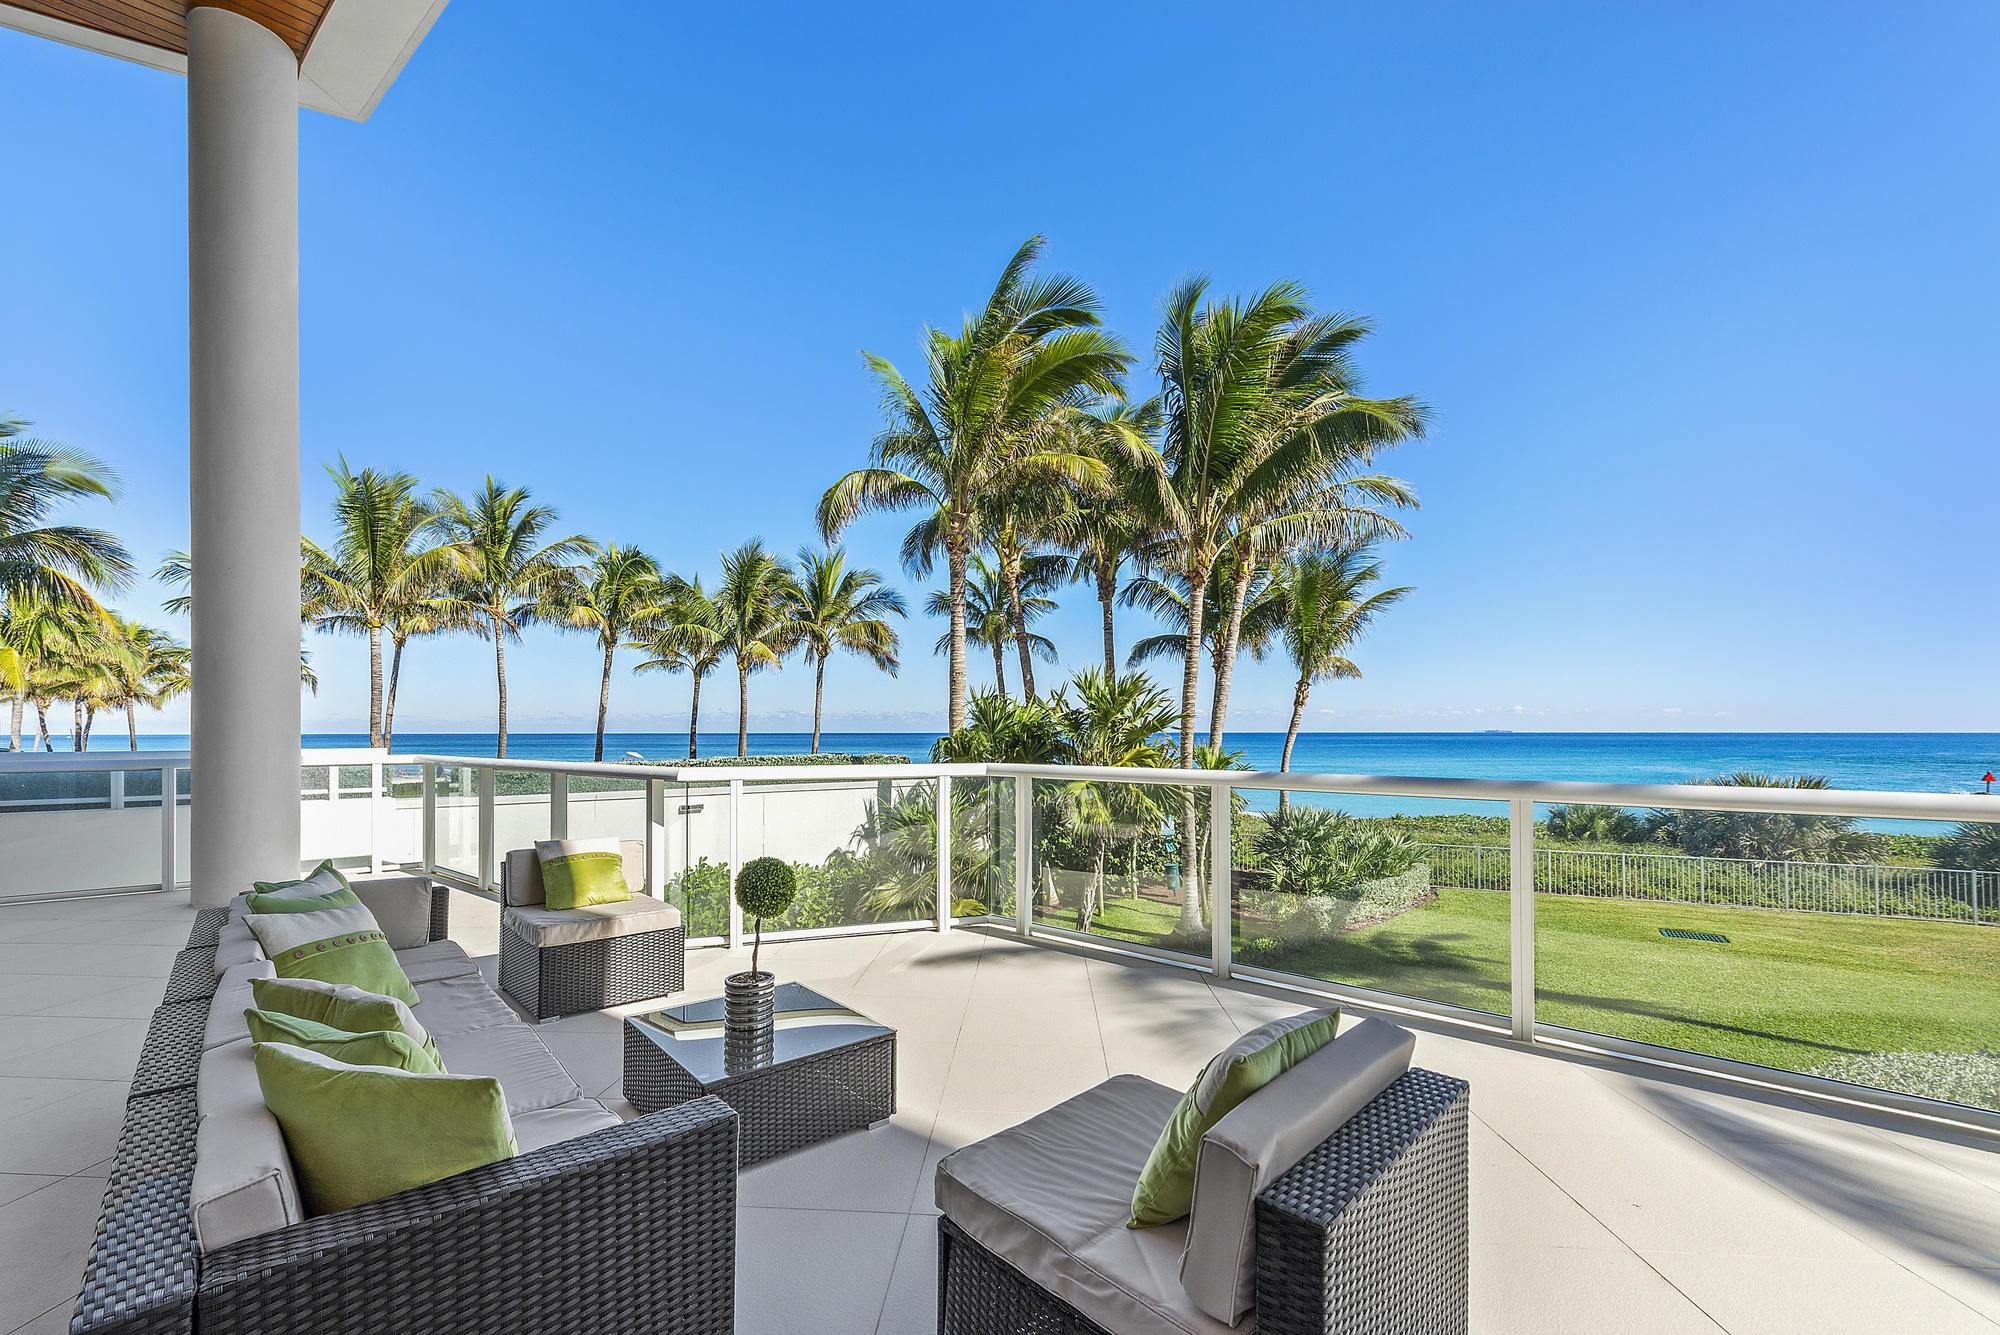 1000 S Ocean Boulevard #107 Boca Raton, FL 33432